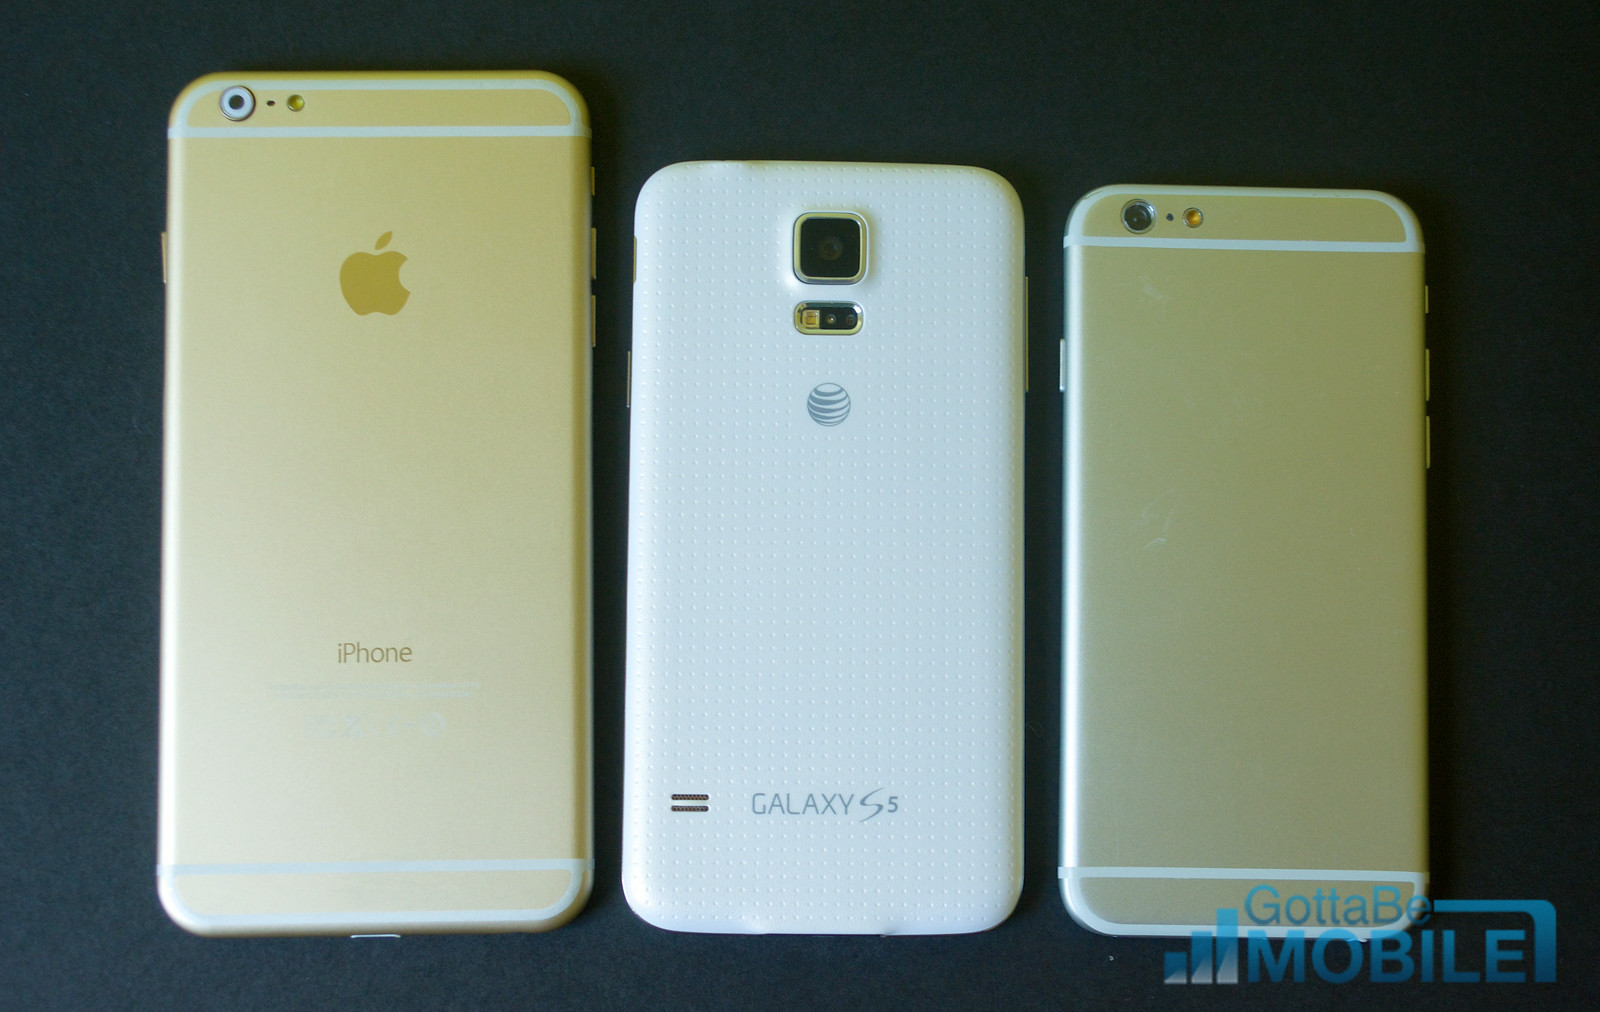 iPhone-6-vs-Galaxy-S5-Size-Comparison.jpg